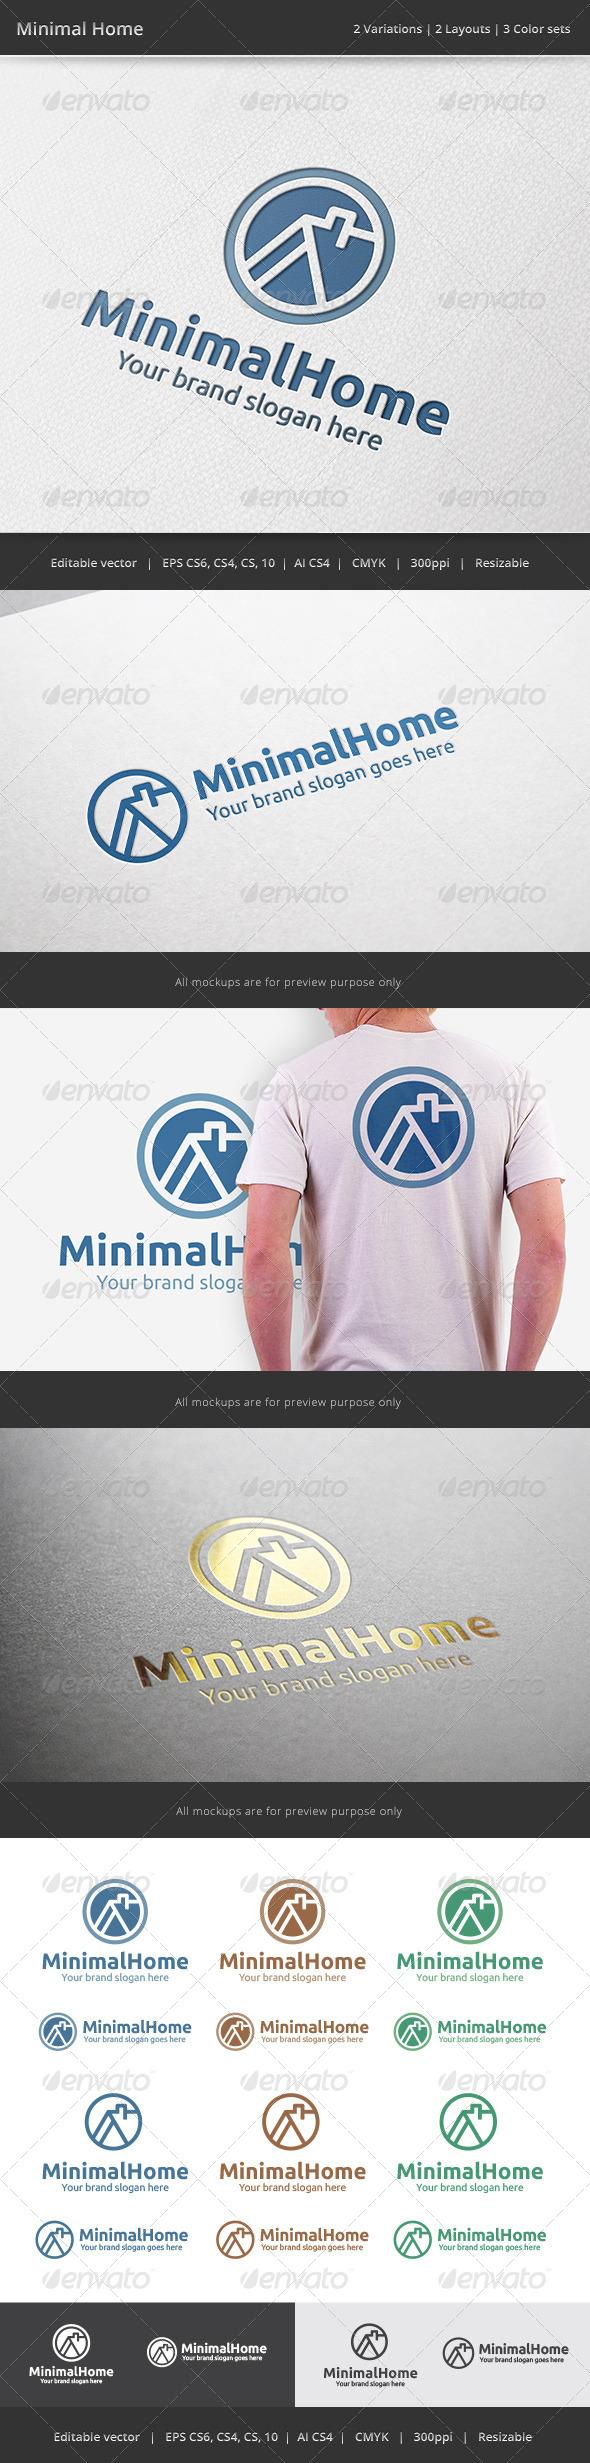 GraphicRiver Minimal Home Logo 7704964